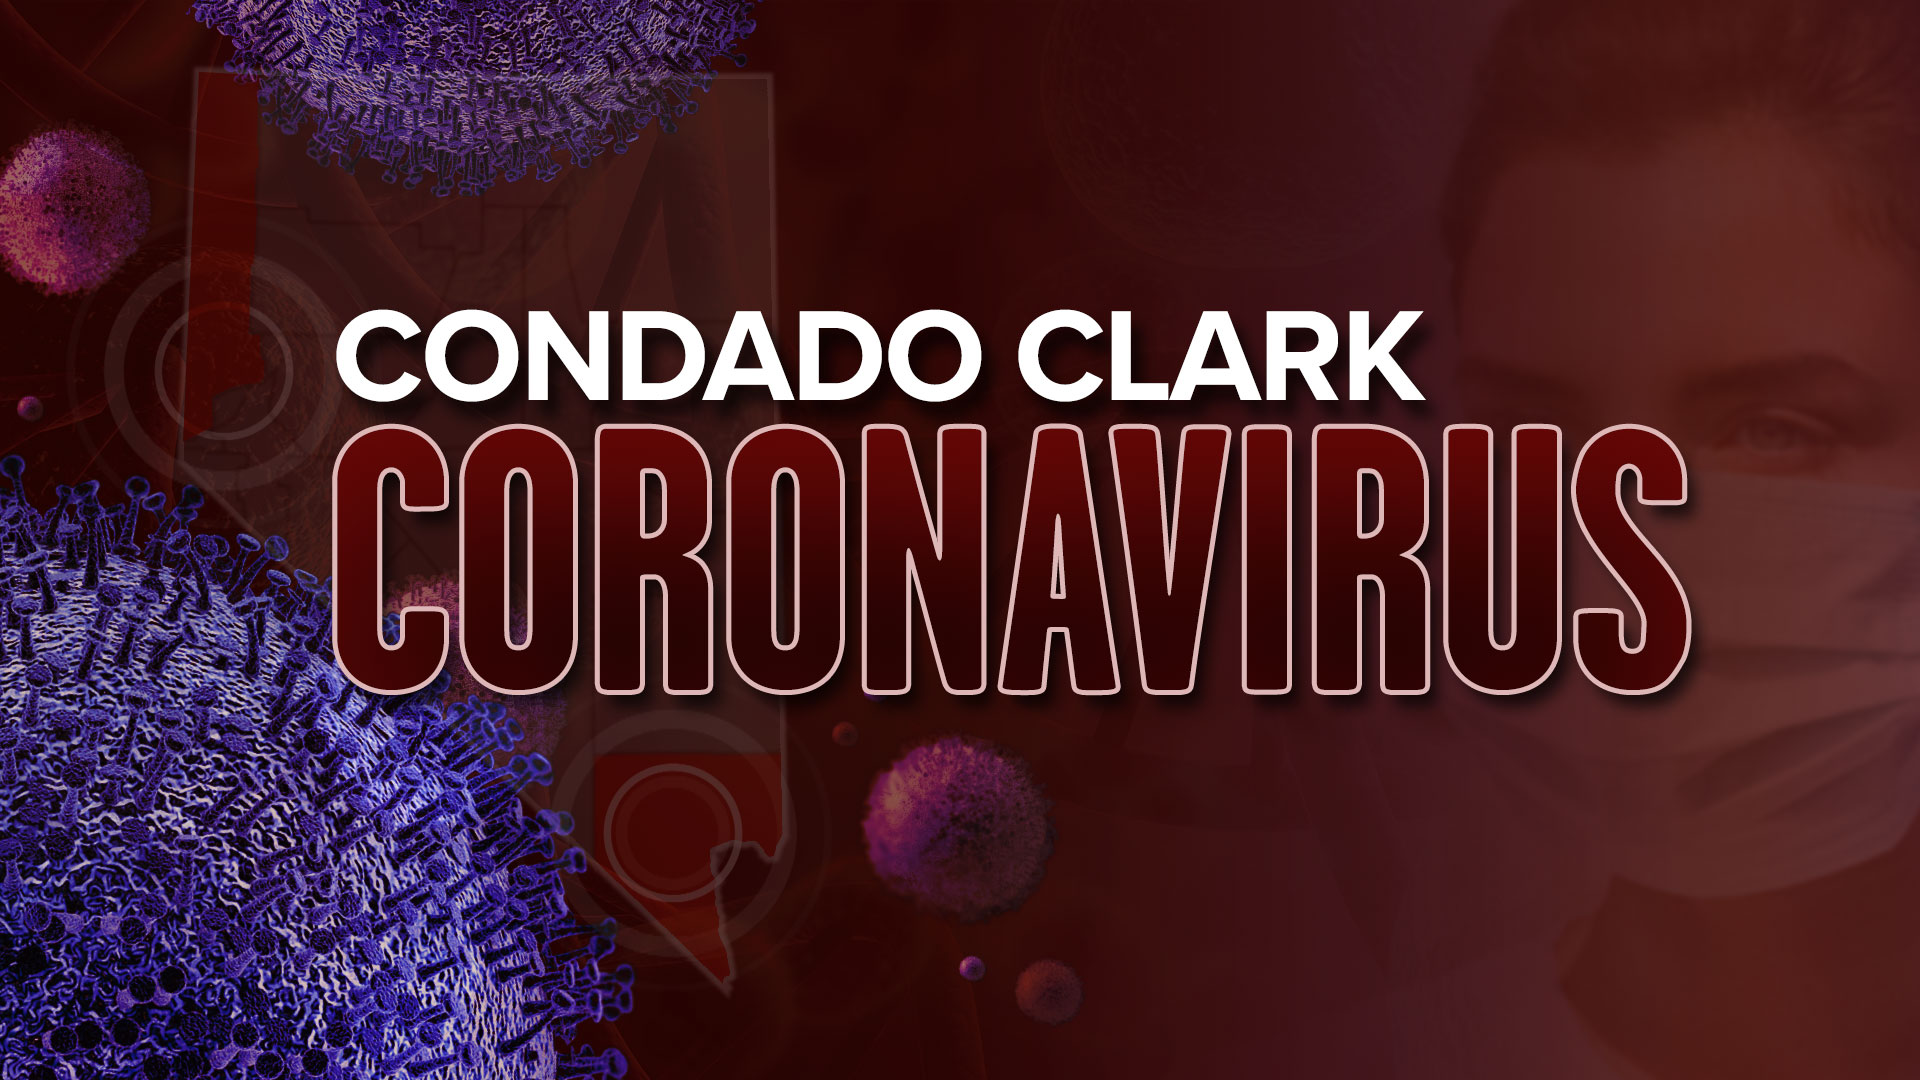 Verwonderend Clark County, local officials provide coronavirus update Tuesday BF-49